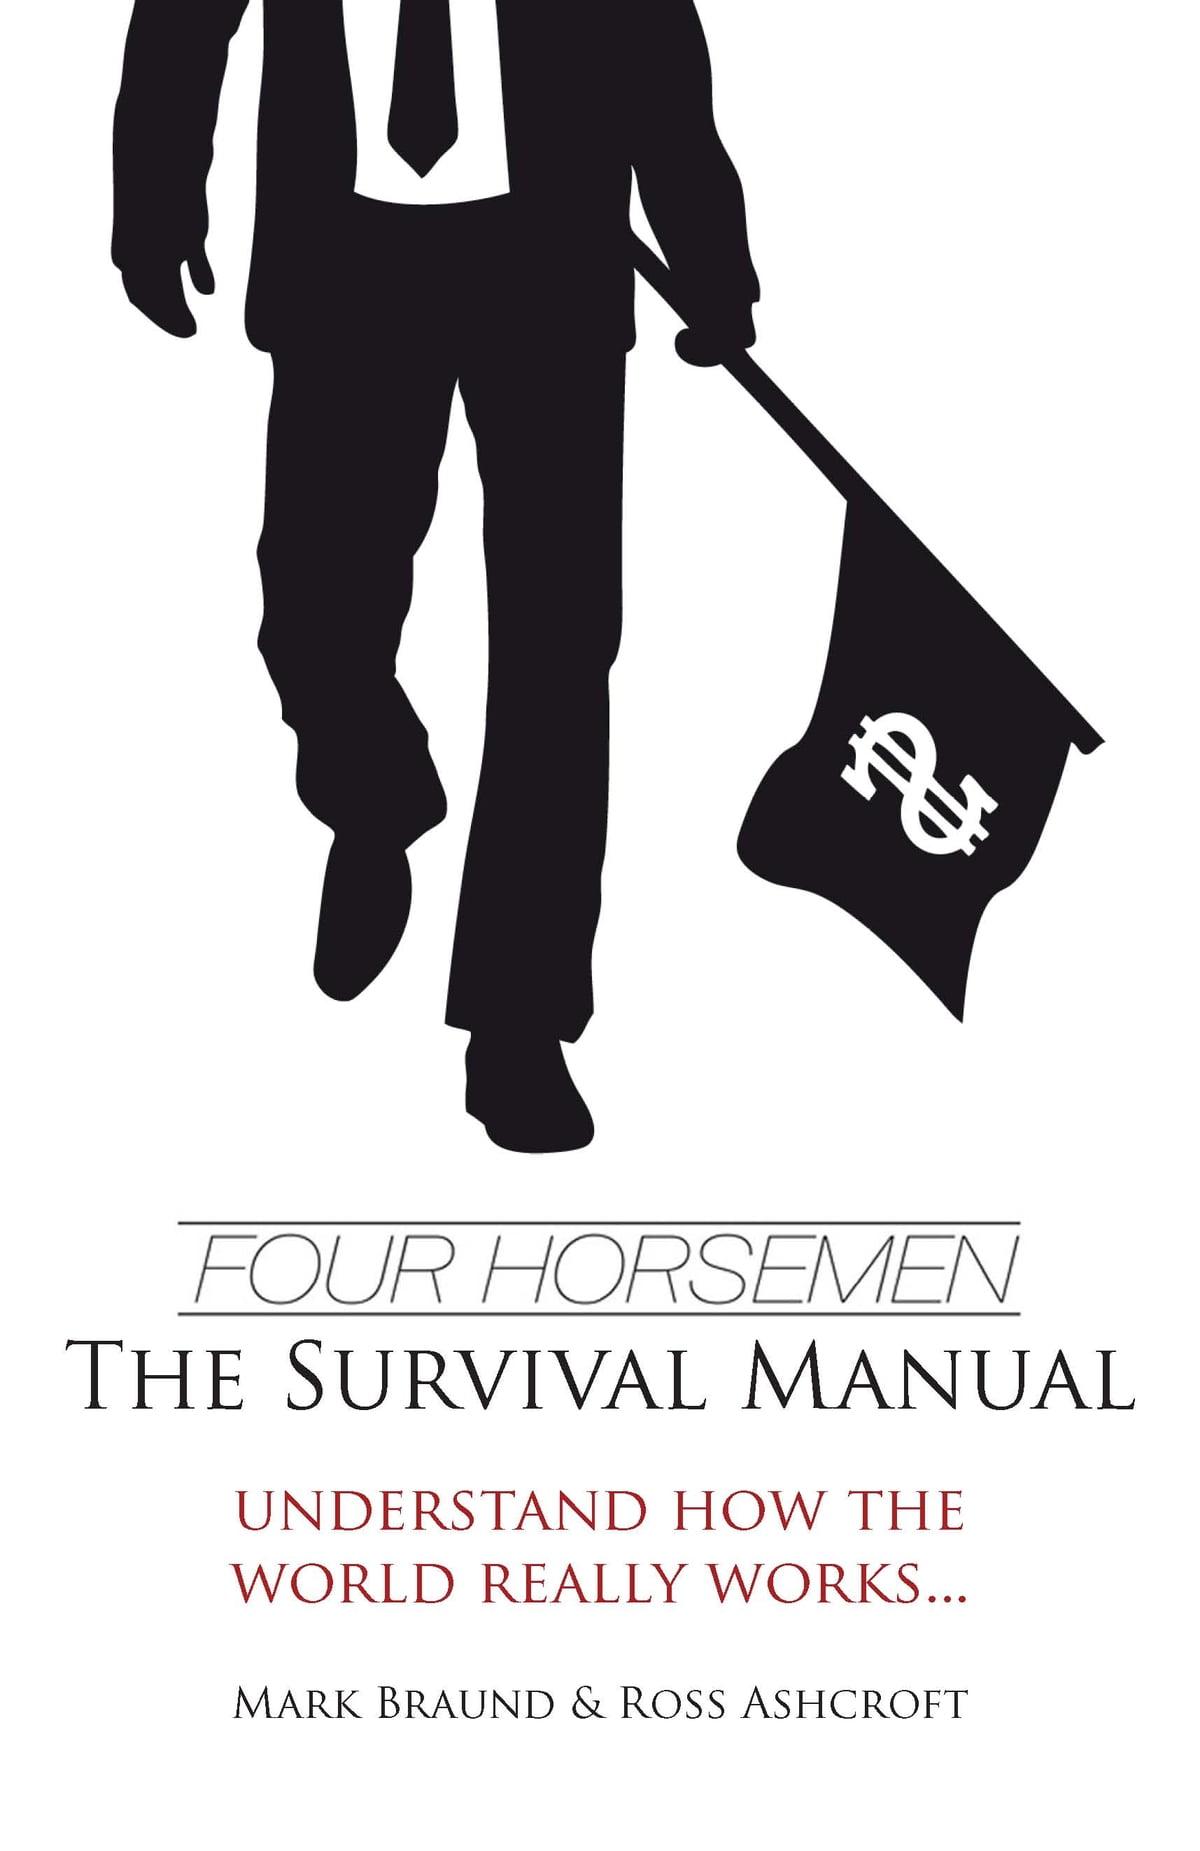 Four Horsemen: The Survival Manual eBook by Mark Braund